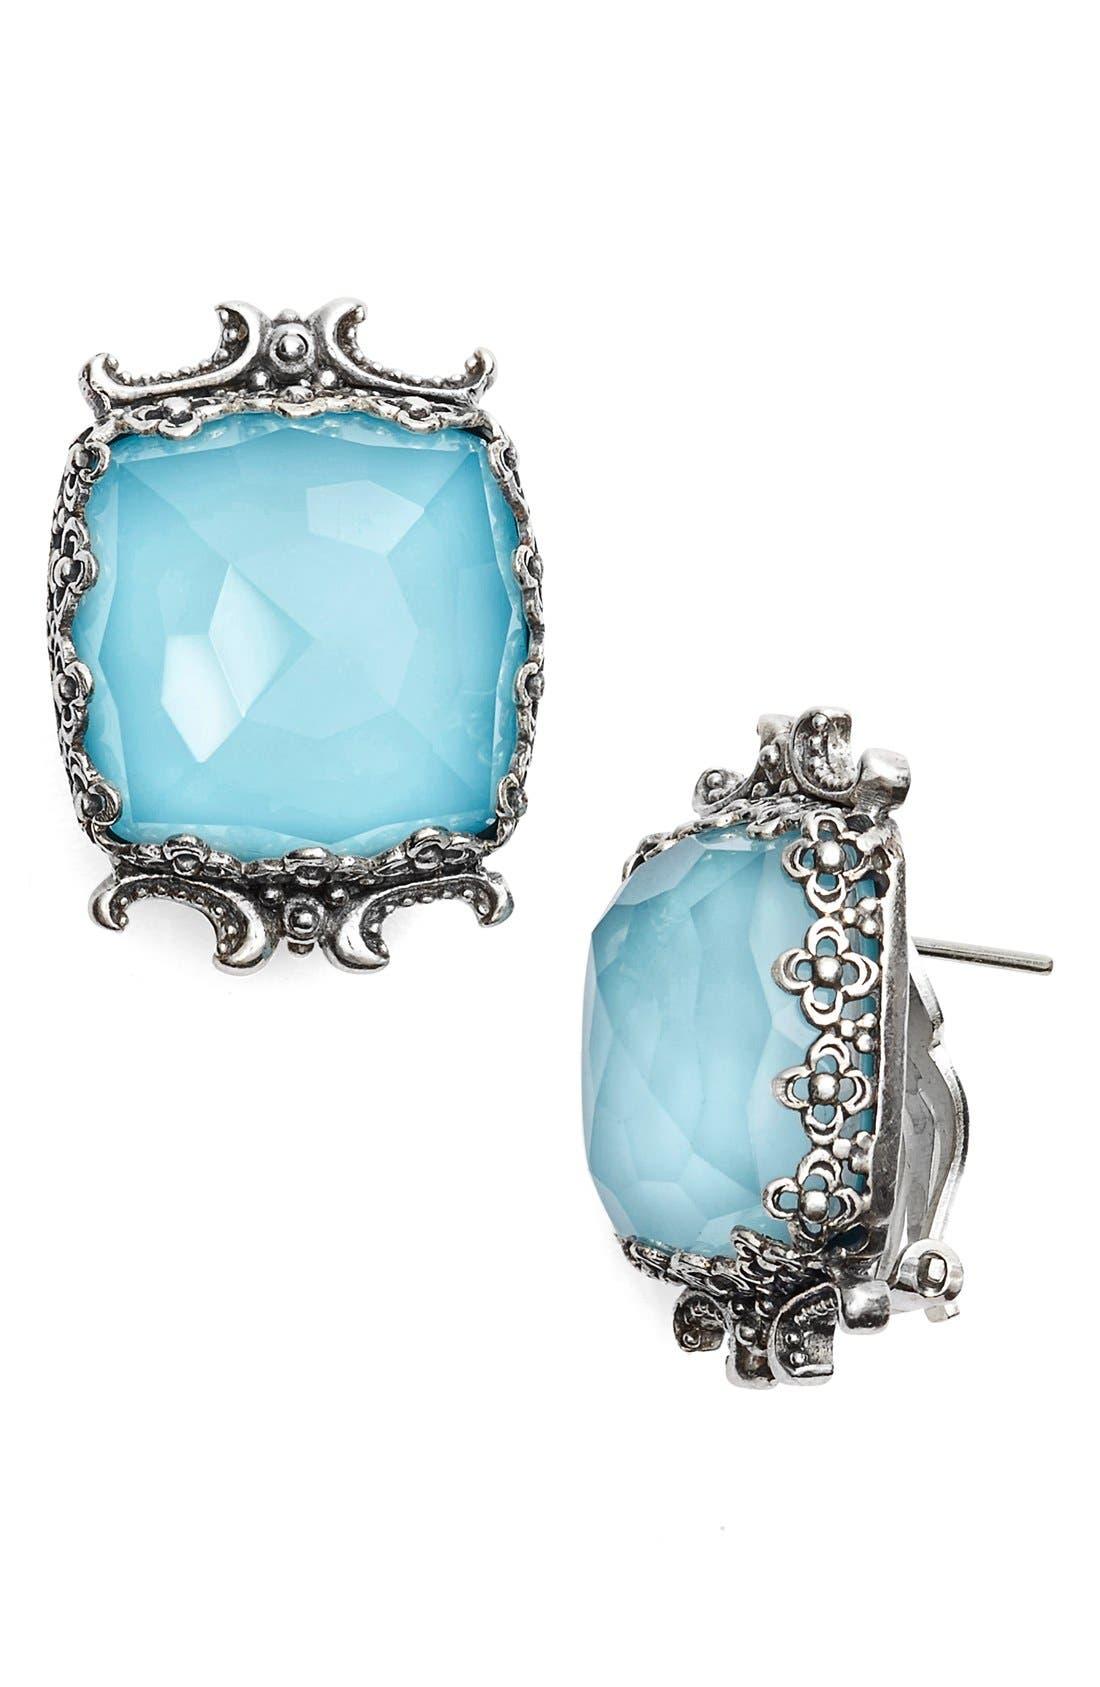 'Aegean' Clip Earrings,                             Main thumbnail 1, color,                             Silver/ Blue Rock Crystal